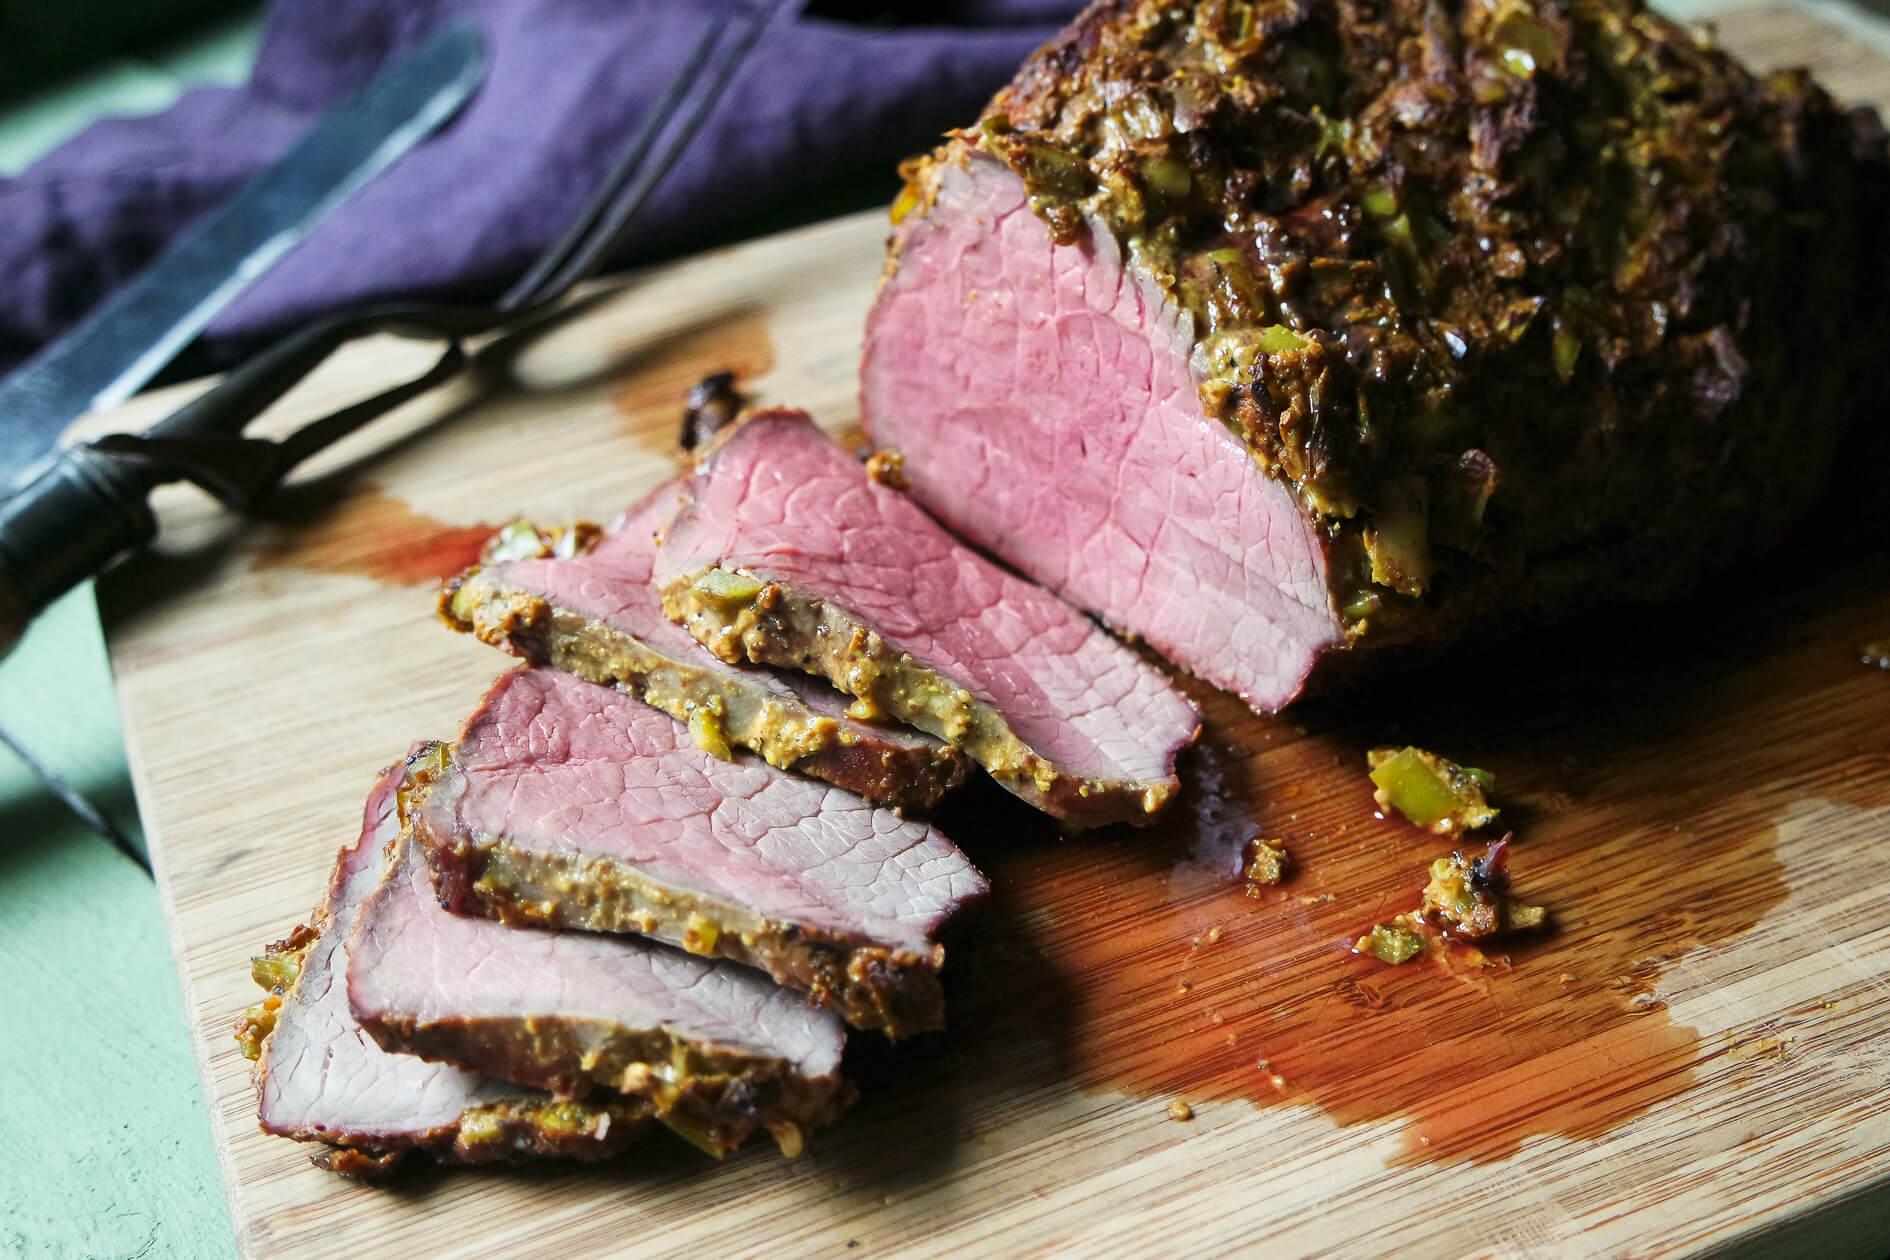 Bottom Round Roast Beef With Hatch Chile Crust Jess Pryles